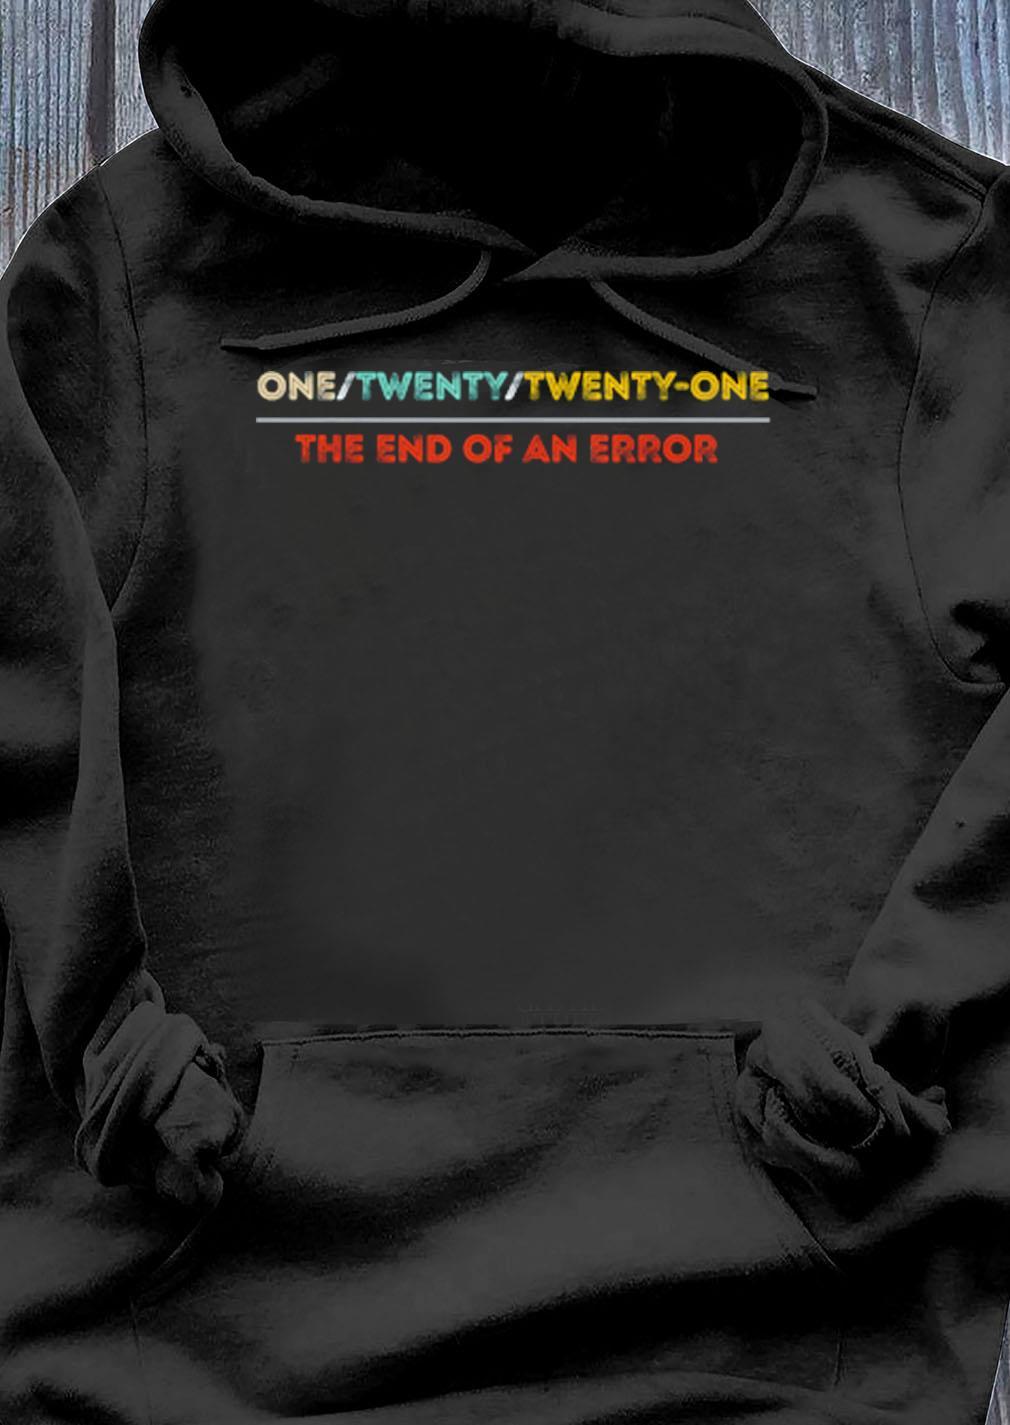 Onetwentytwenty One The End Of An Error Retro Shirt Hoodie